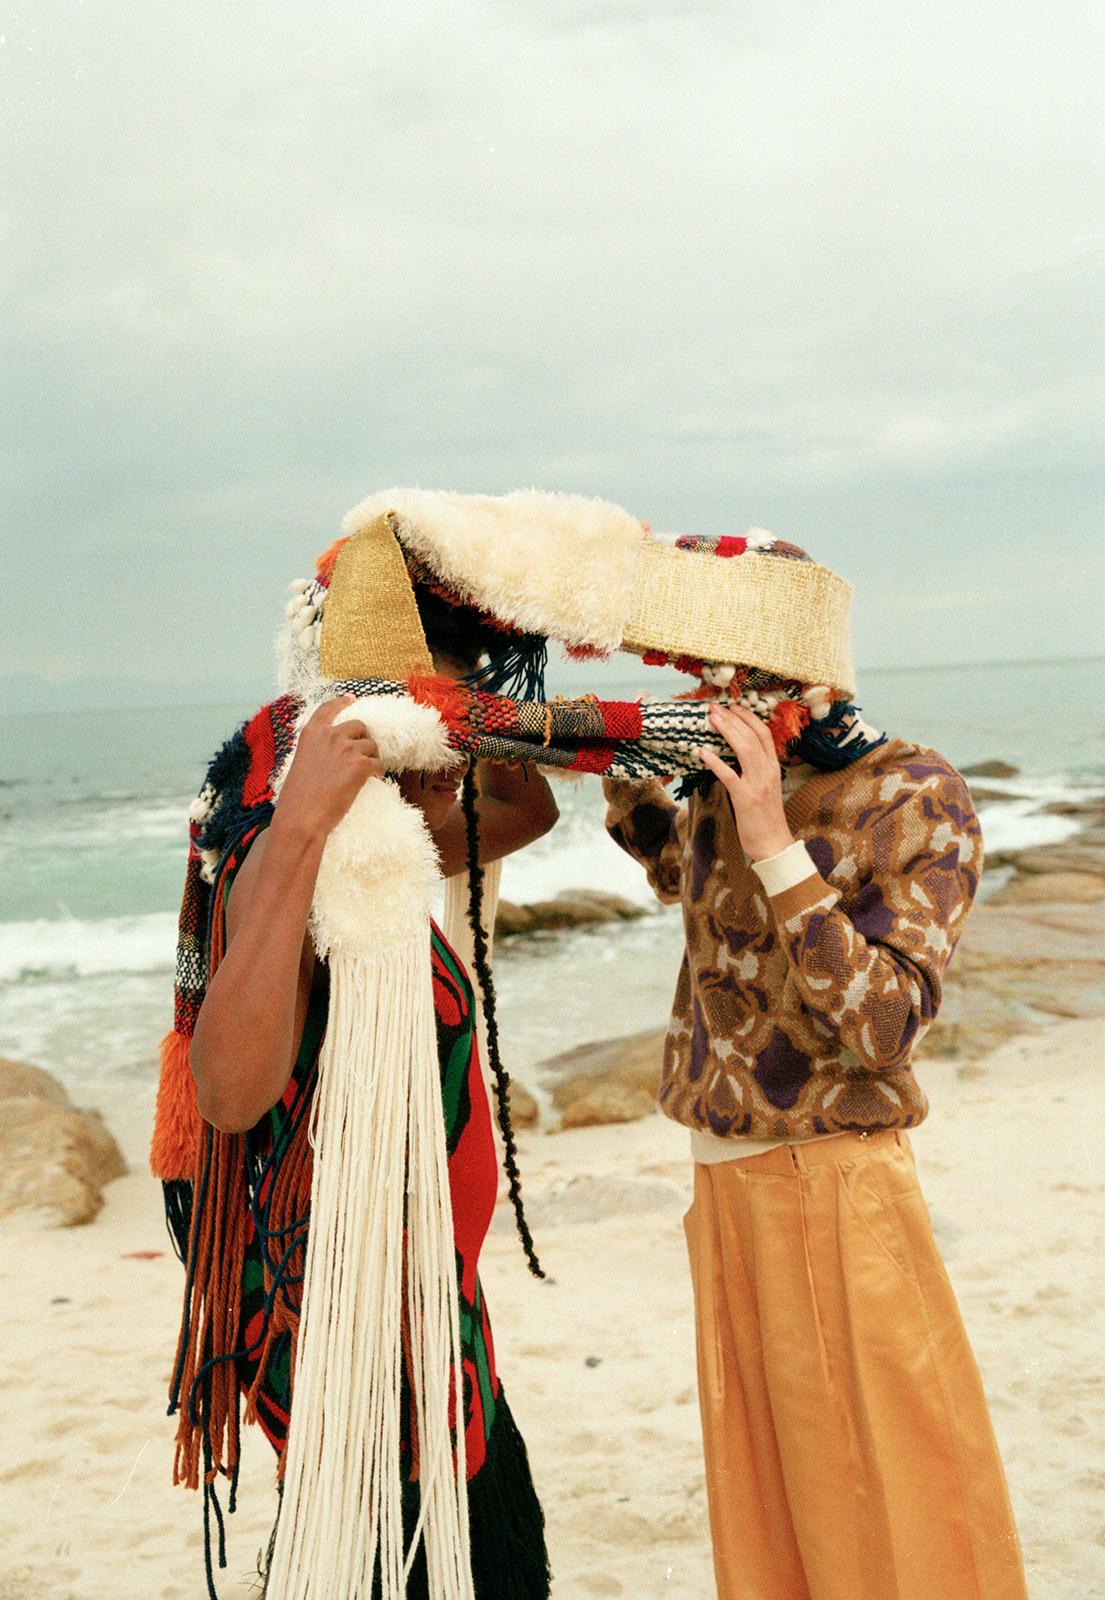 Caroline Mackintosh captures the slow-burning creativity of South African designers